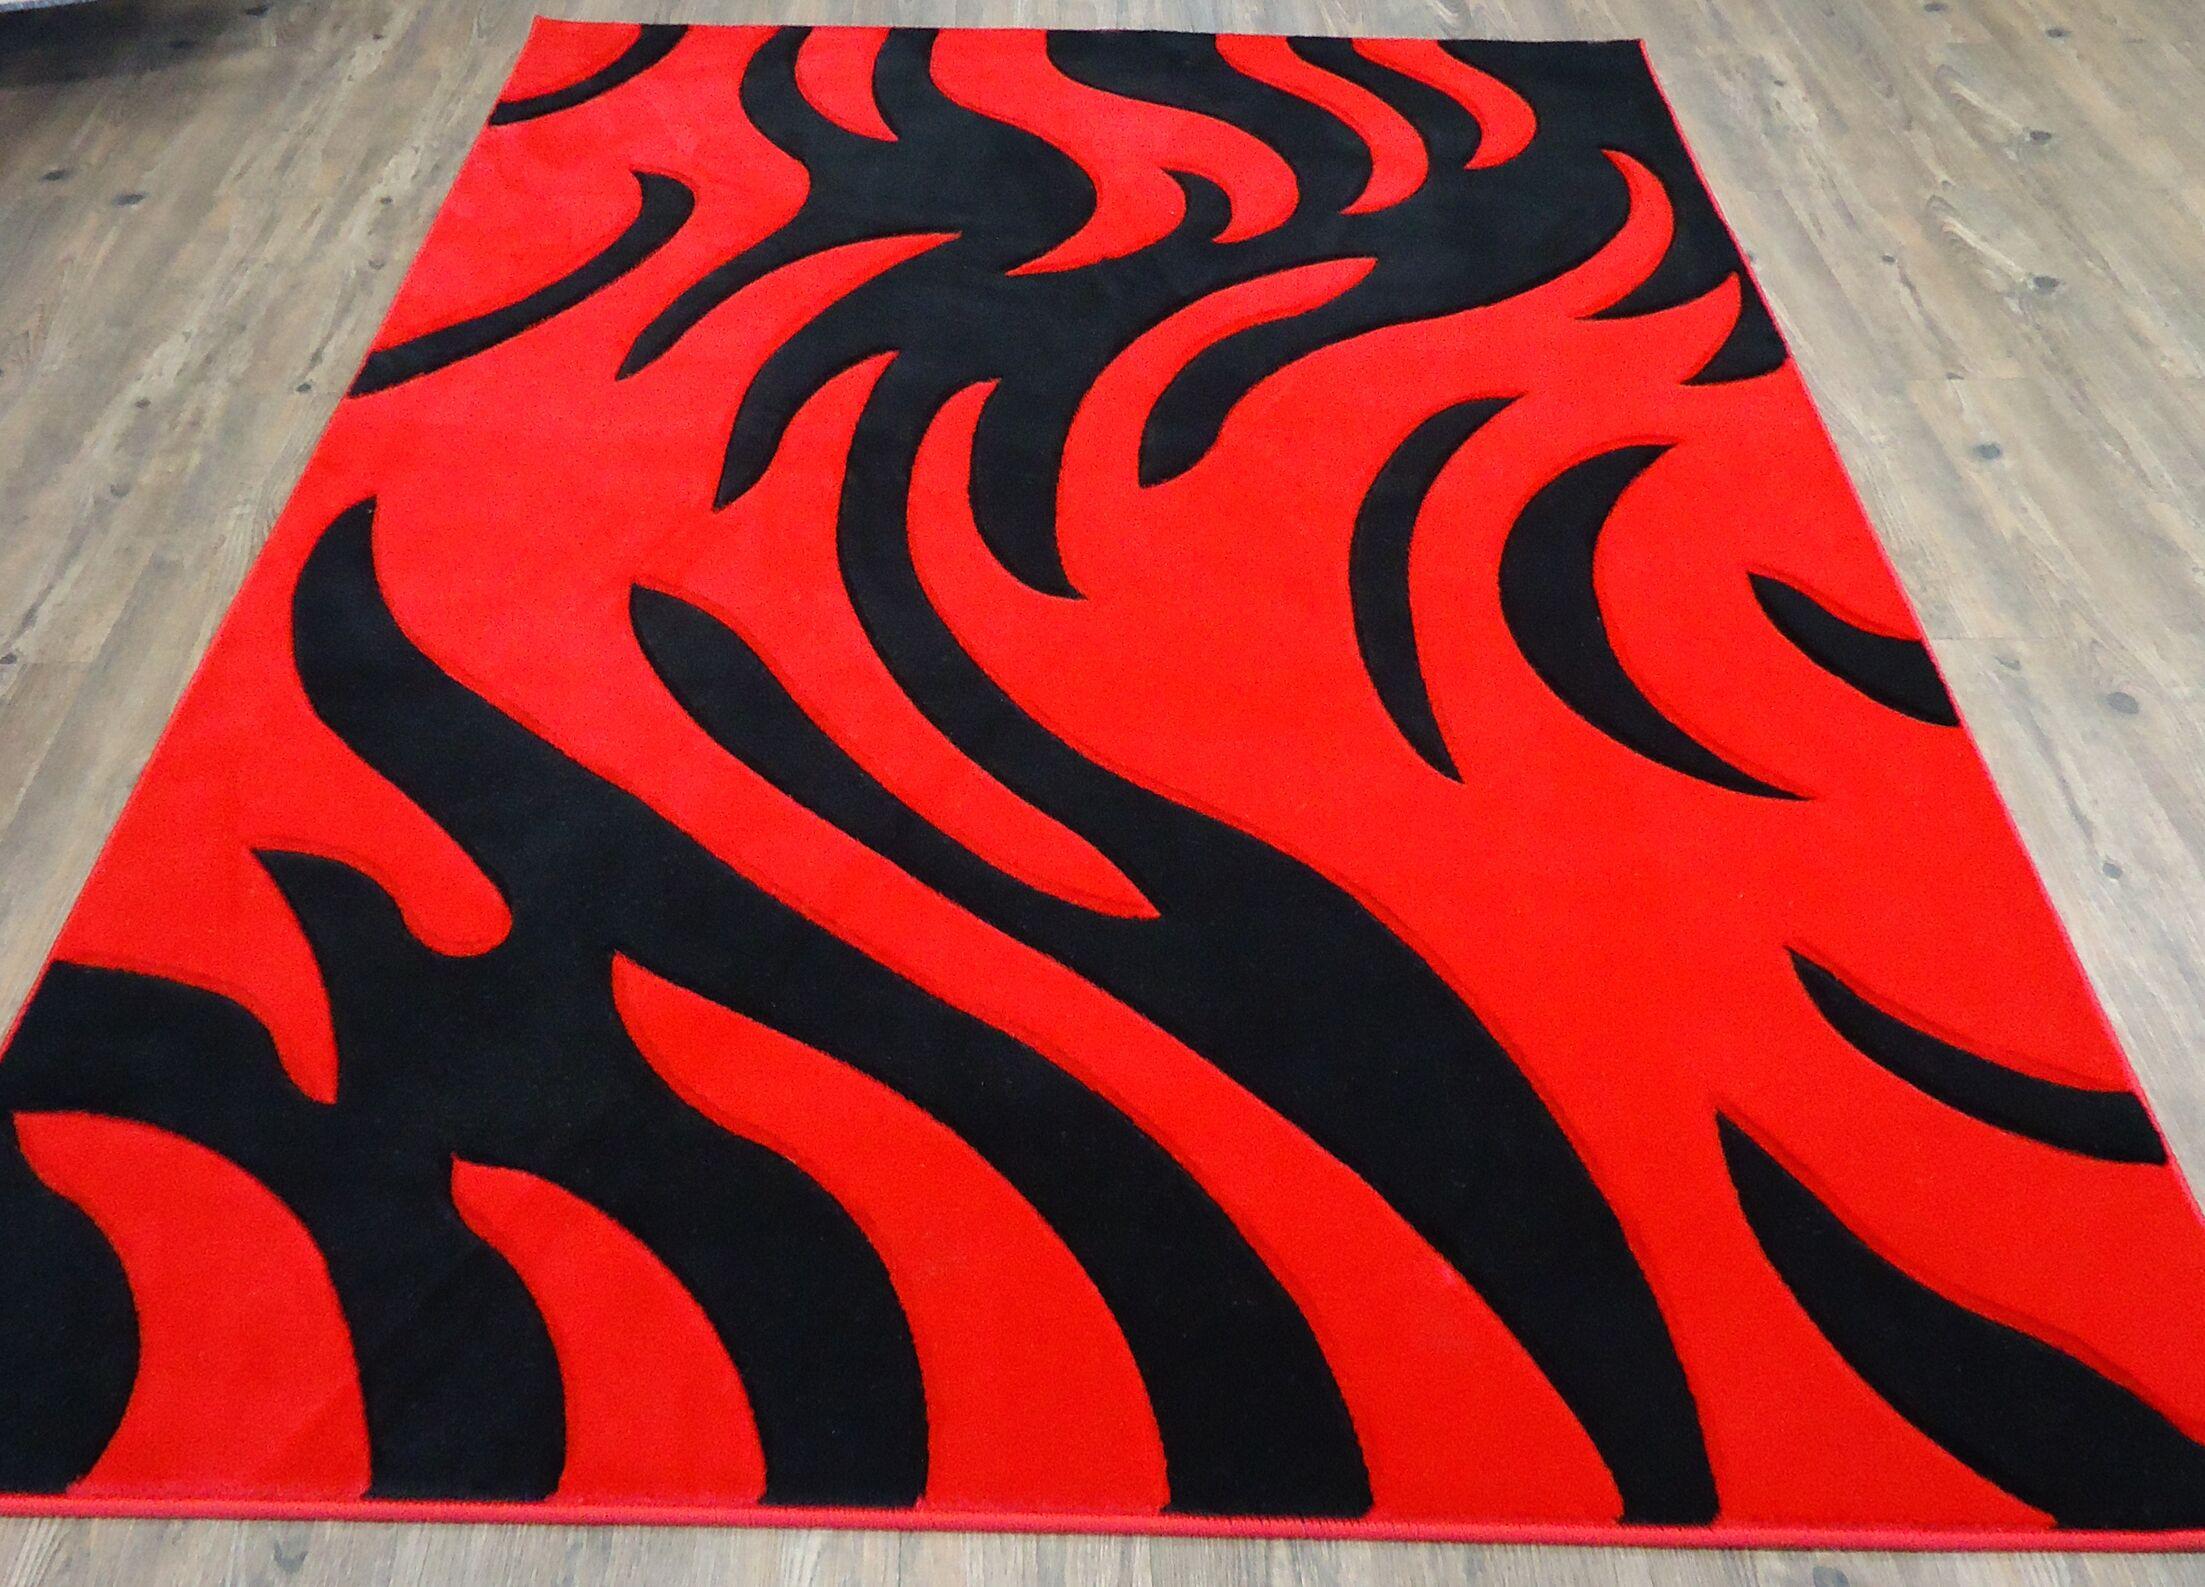 Haigler Red Area Rug Rug Size: Rectangle 5'4